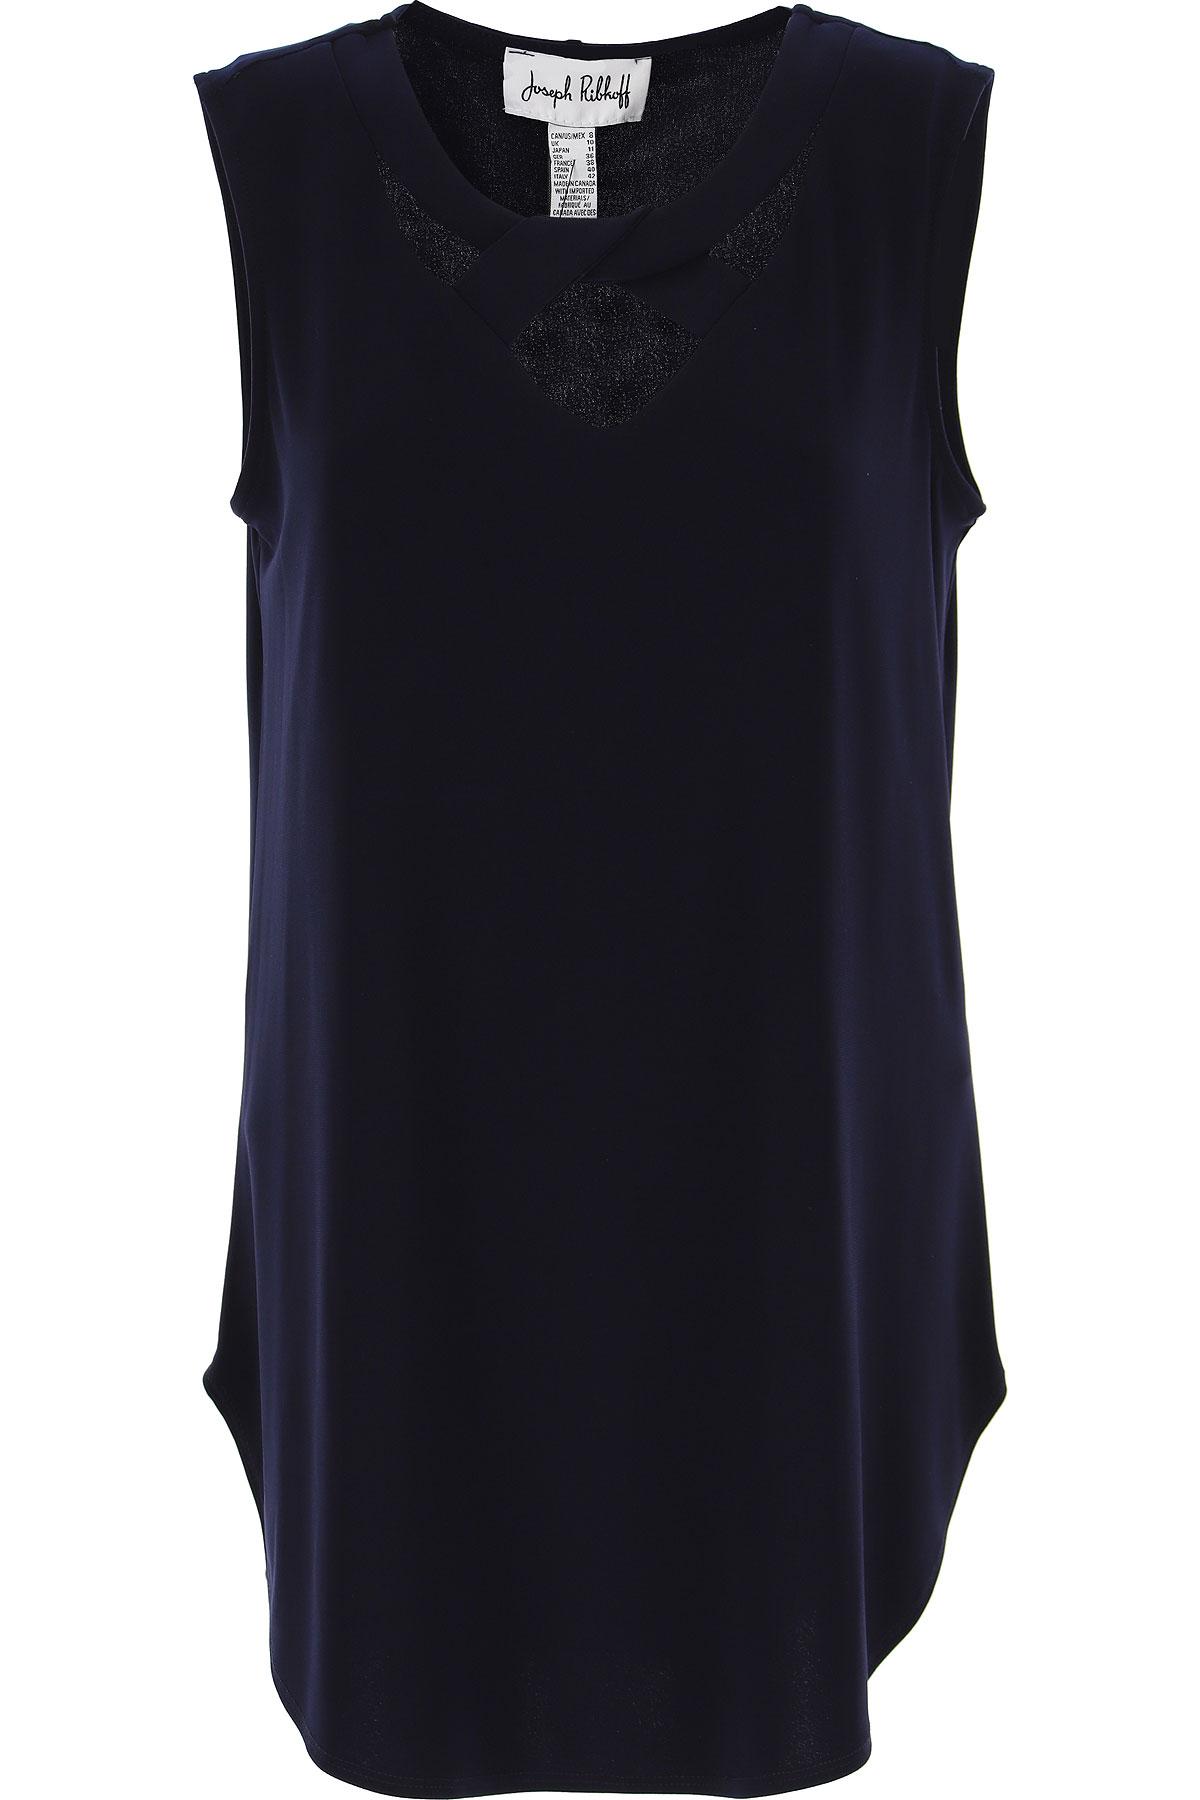 Joseph Ribkoff Top for Women On Sale, Dark Ink Blue, polyester, 2019, 10 14 6 8